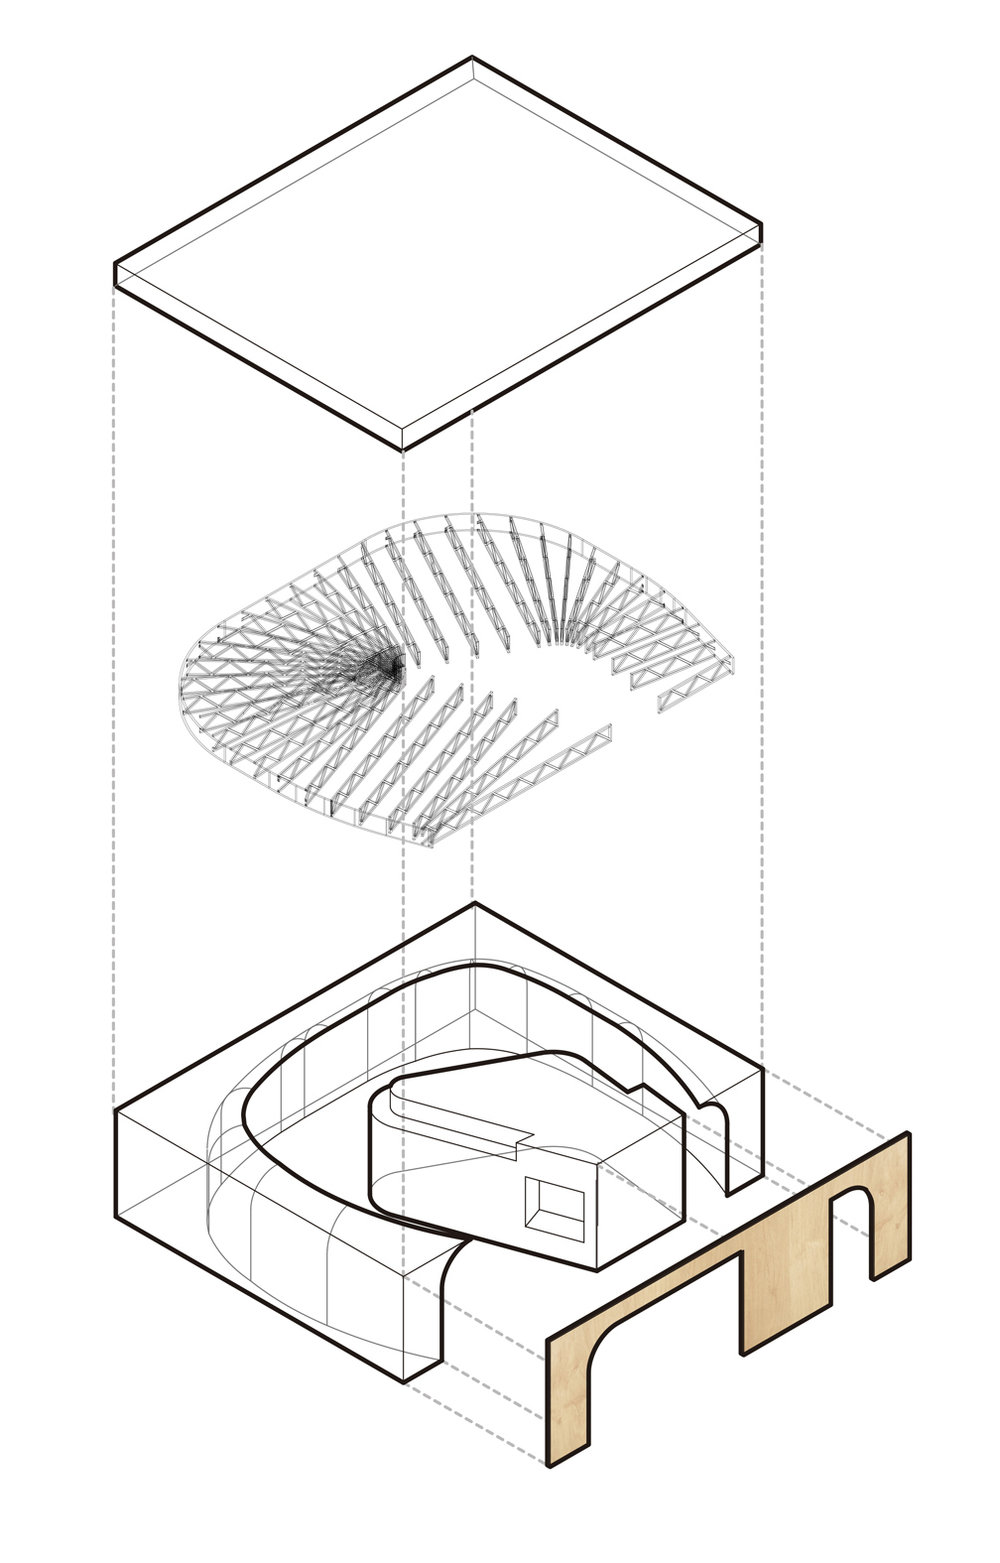 san diego modern architecture, ramiro losada amor, alberto garcia 01.jpg